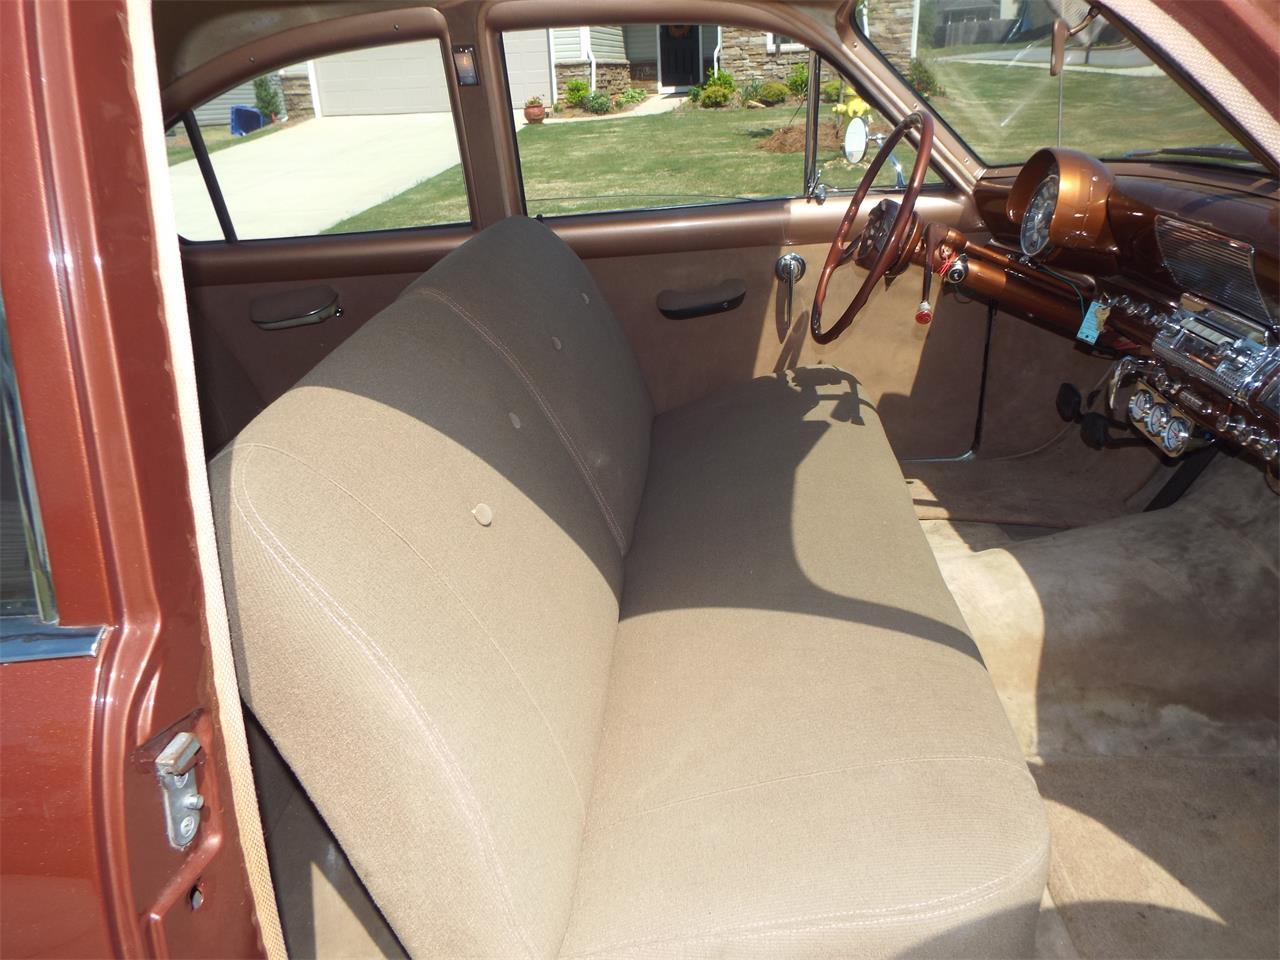 1951 Kaiser 2-Dr Sedan (CC-1212810) for sale in Greenville, South Carolina